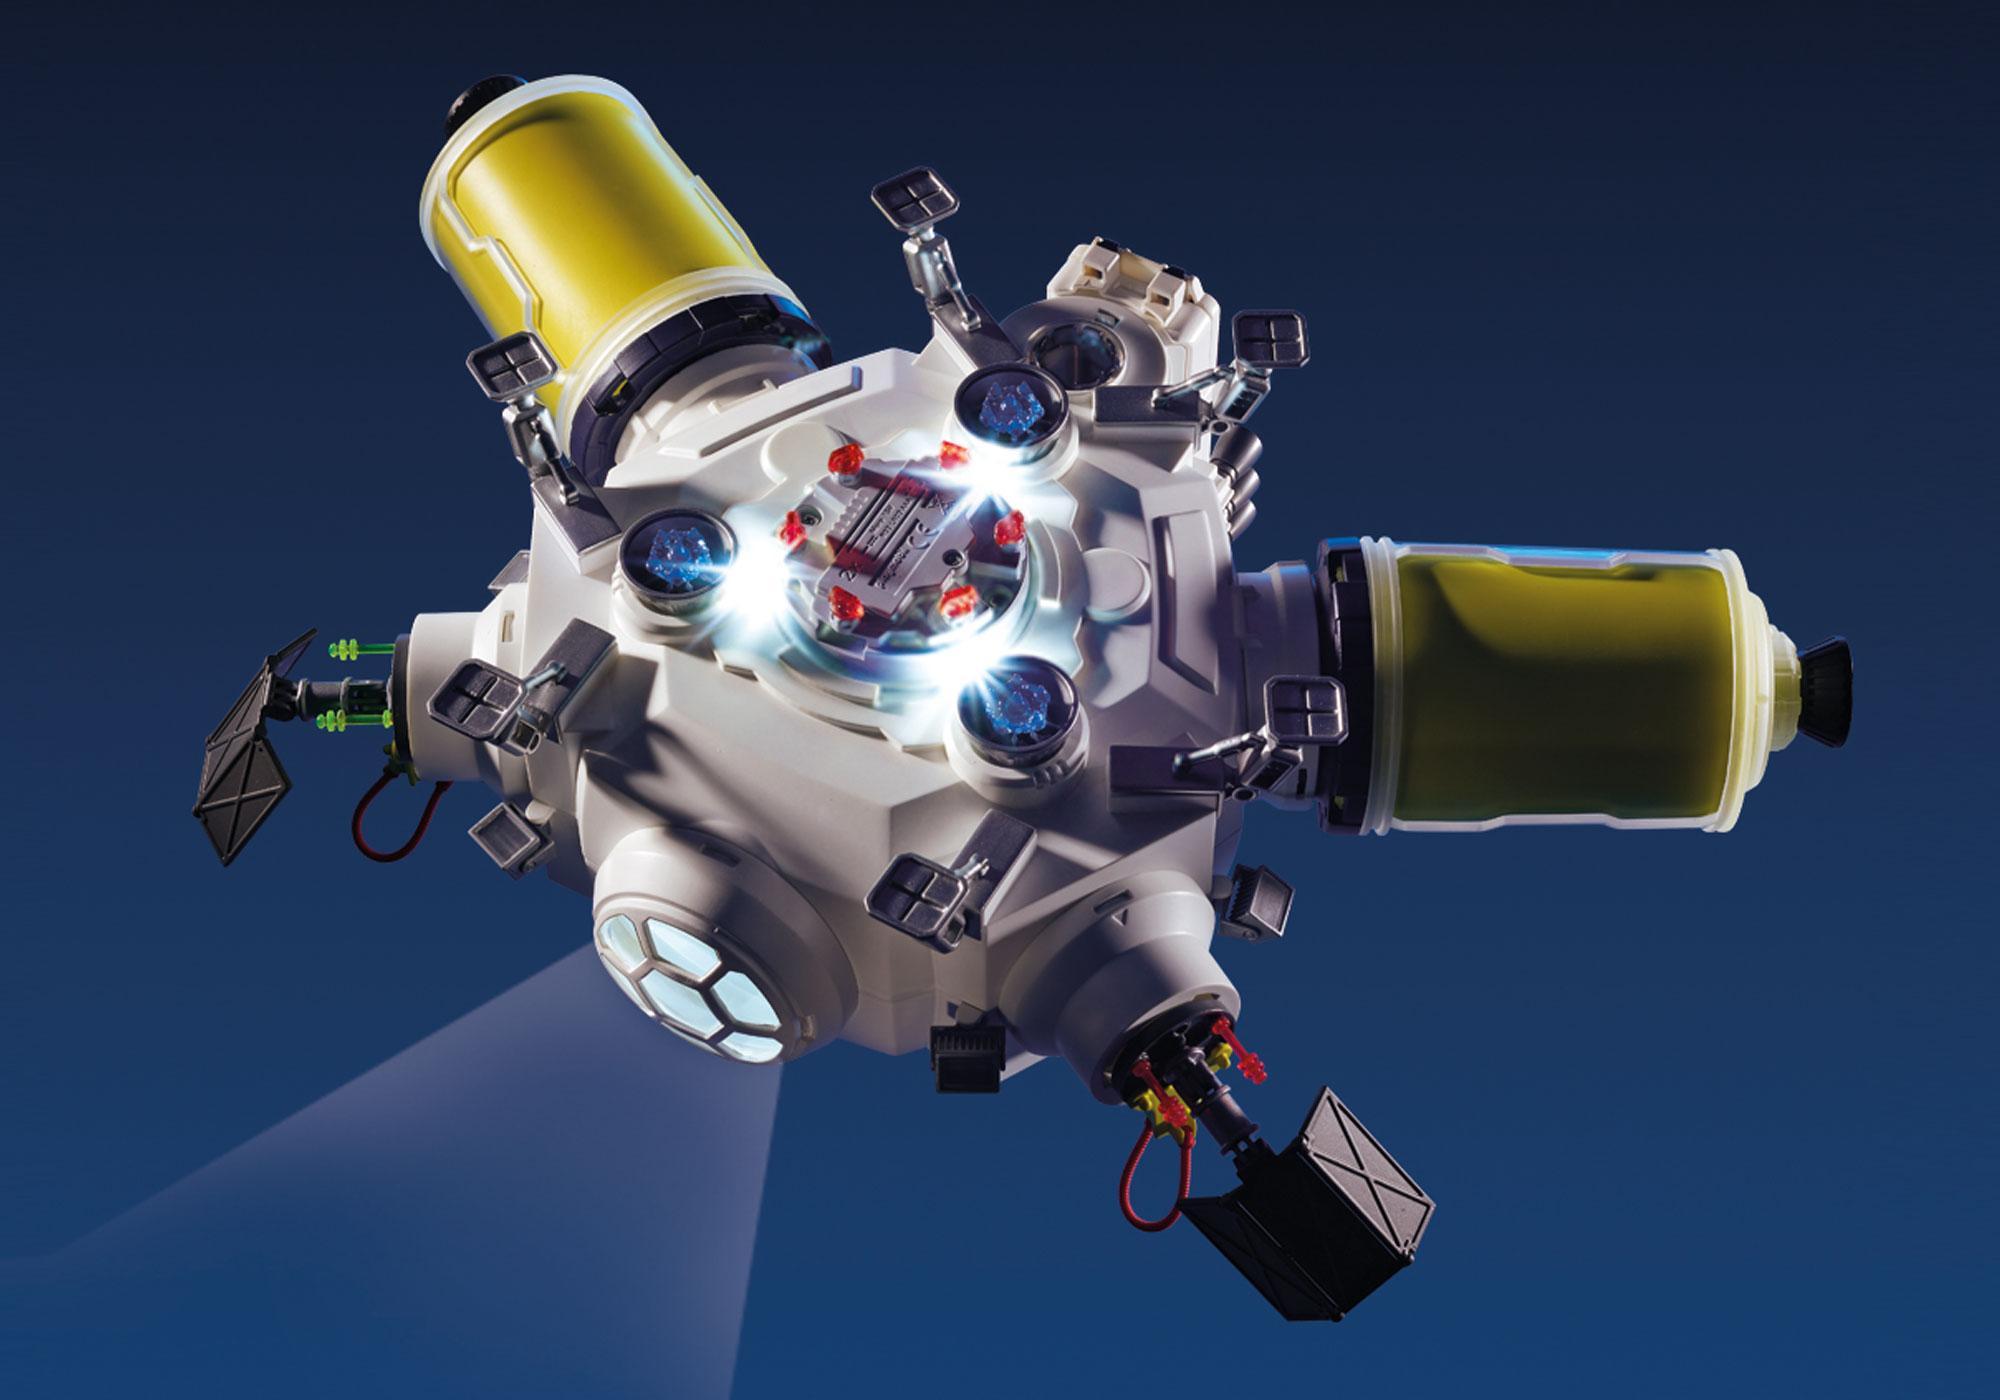 http://media.playmobil.com/i/playmobil/9487_product_extra1/Διαστημικός Σταθμός στον Άρη